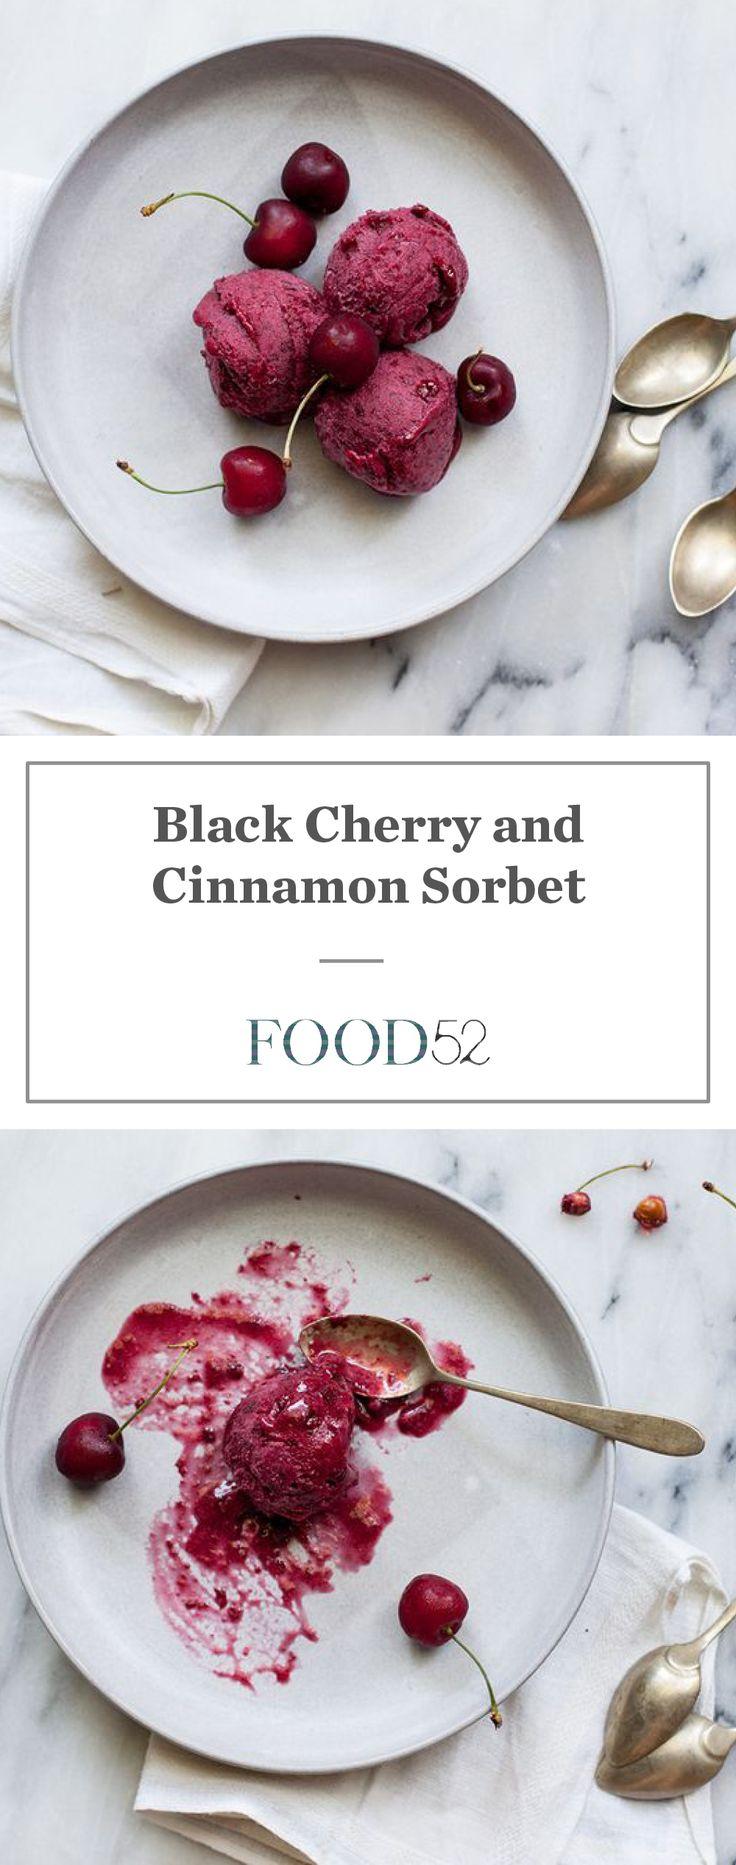 Black cherry and cinnamon sorbet